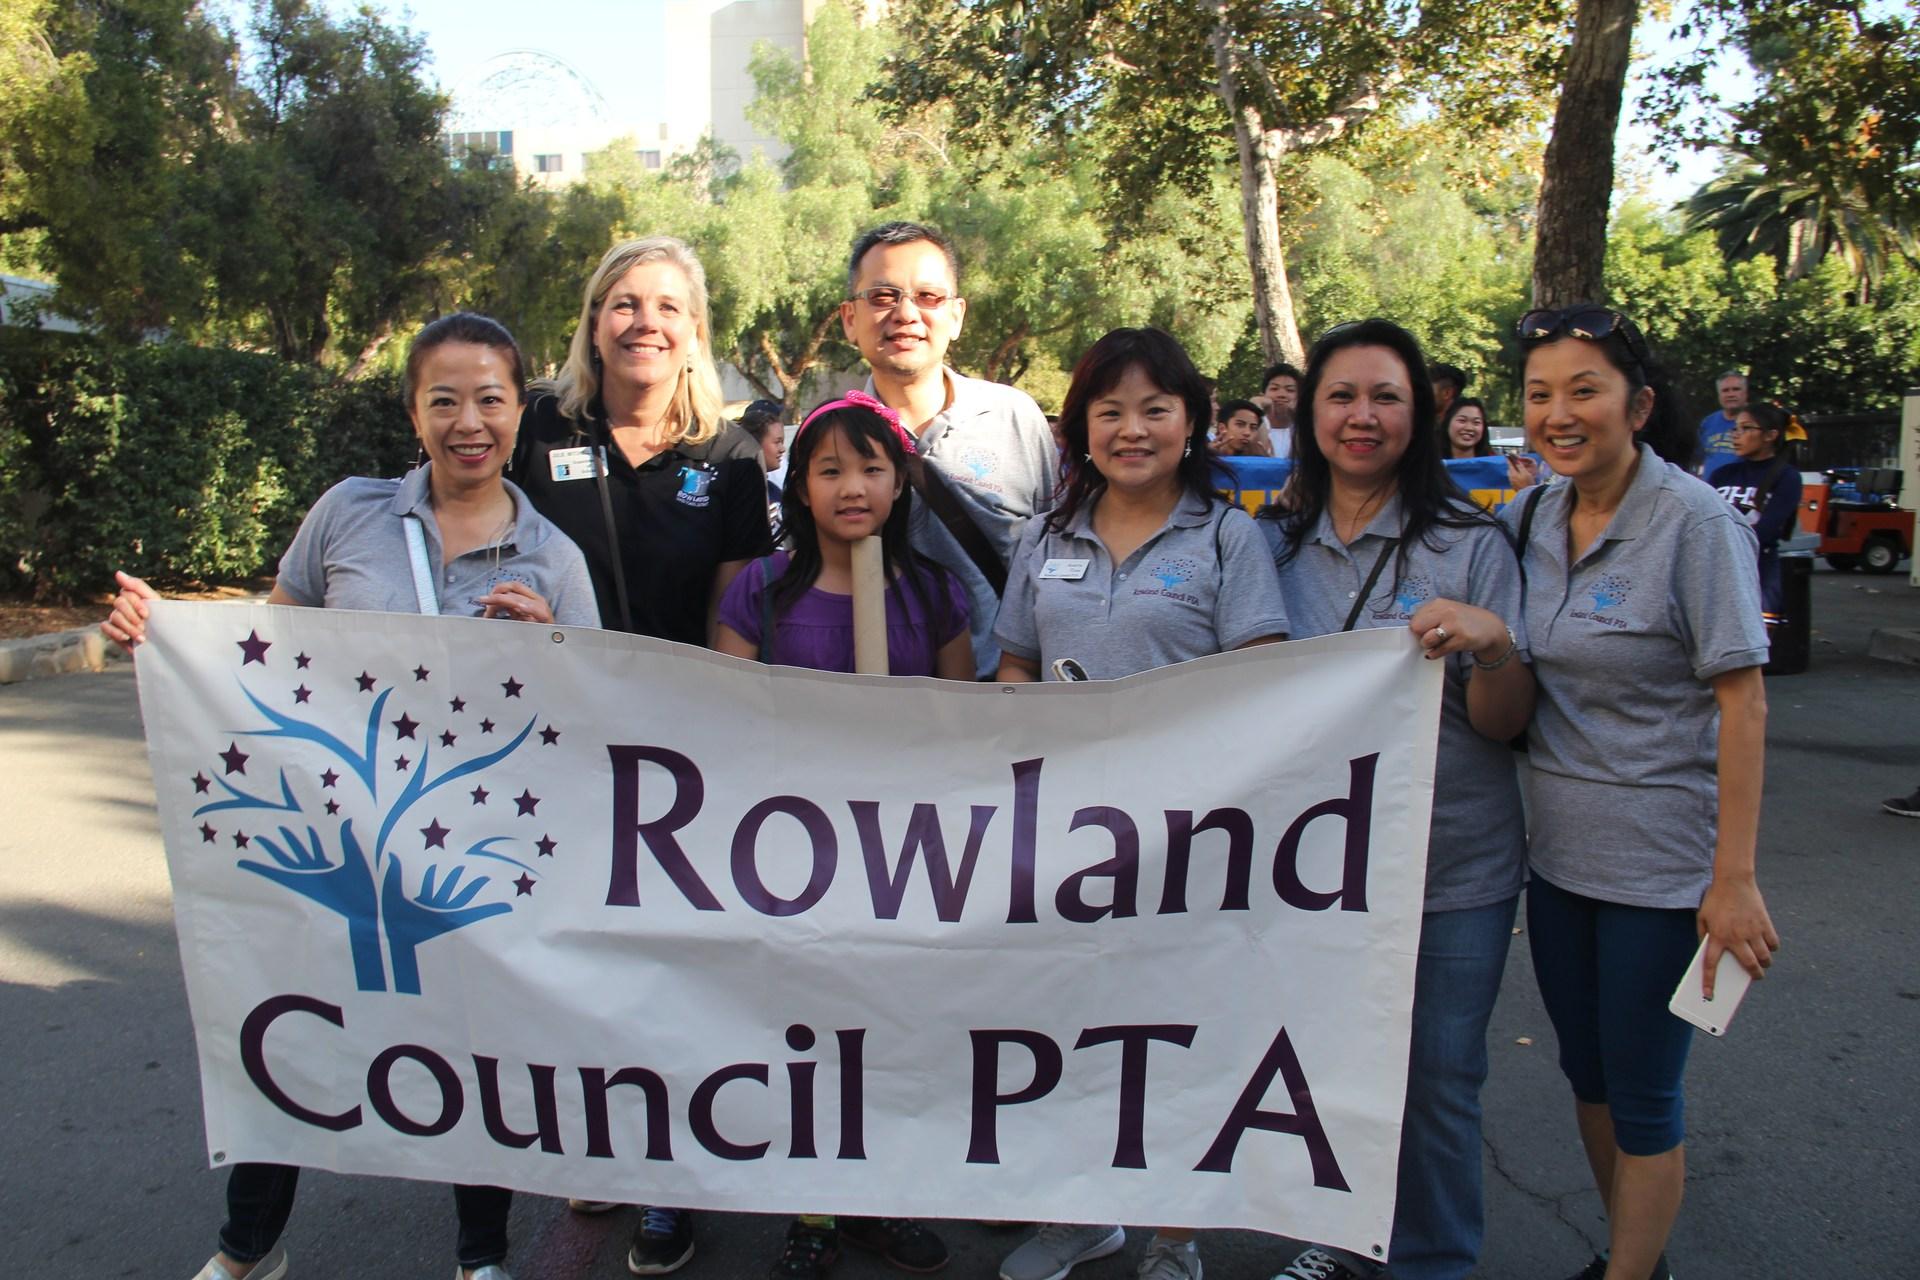 Rowland PTA